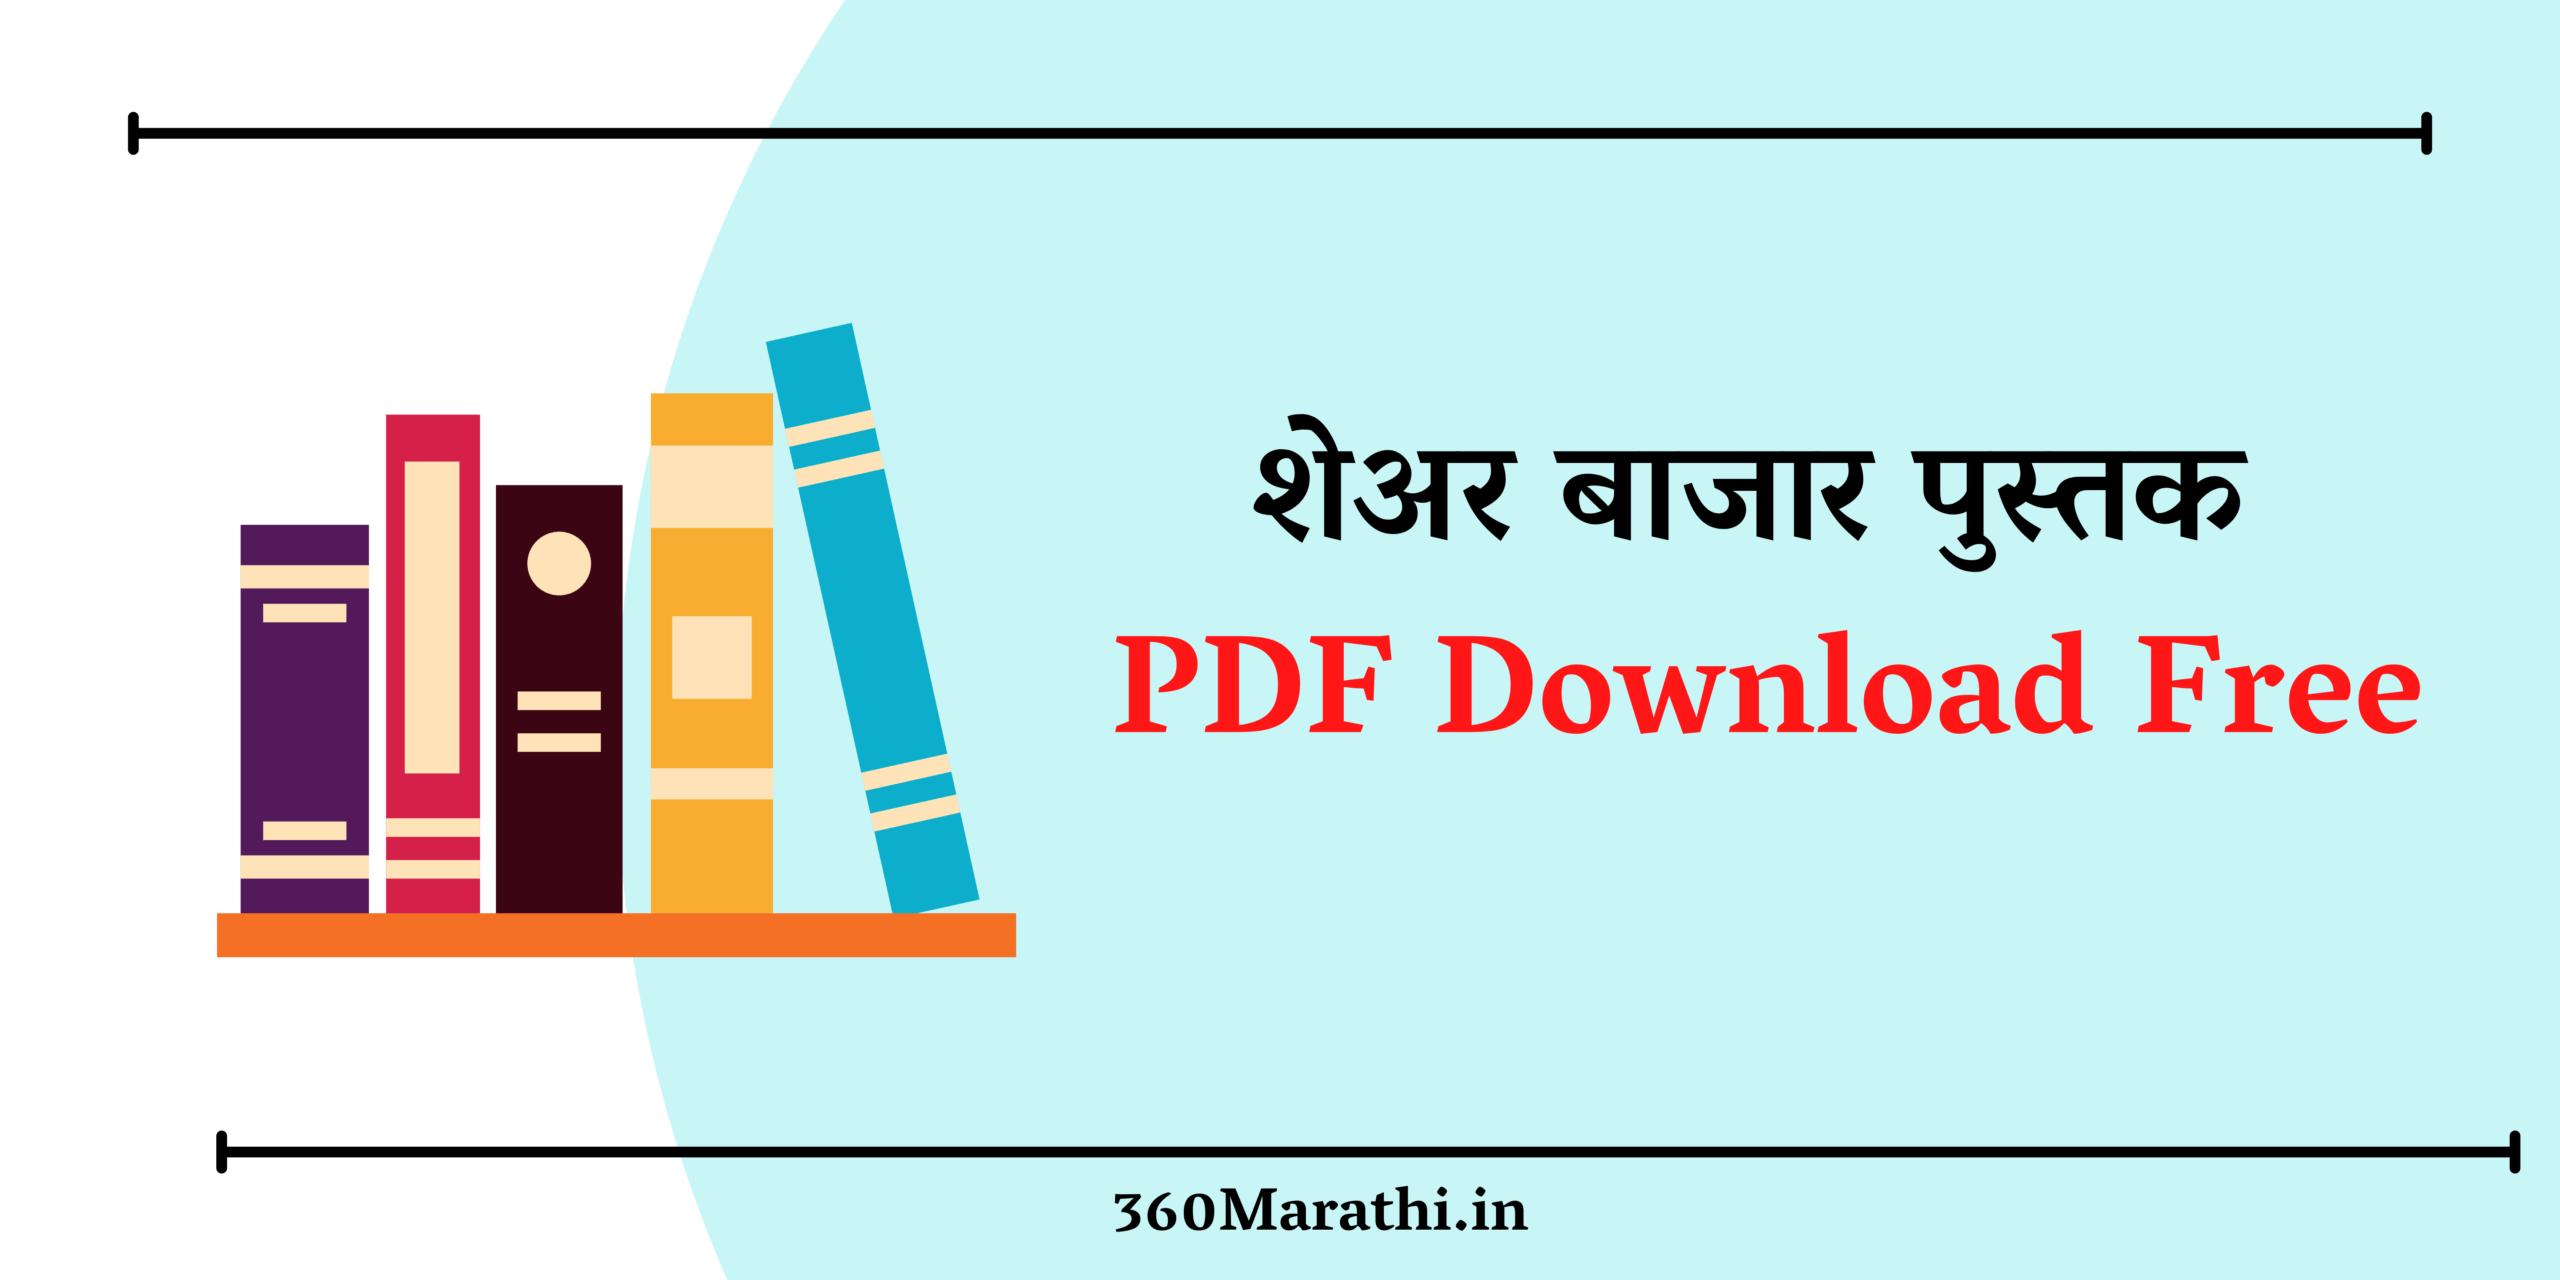 (Free PDF) शेअर बाजार पुस्तक   Share Market Marathi Books PDF Free Download